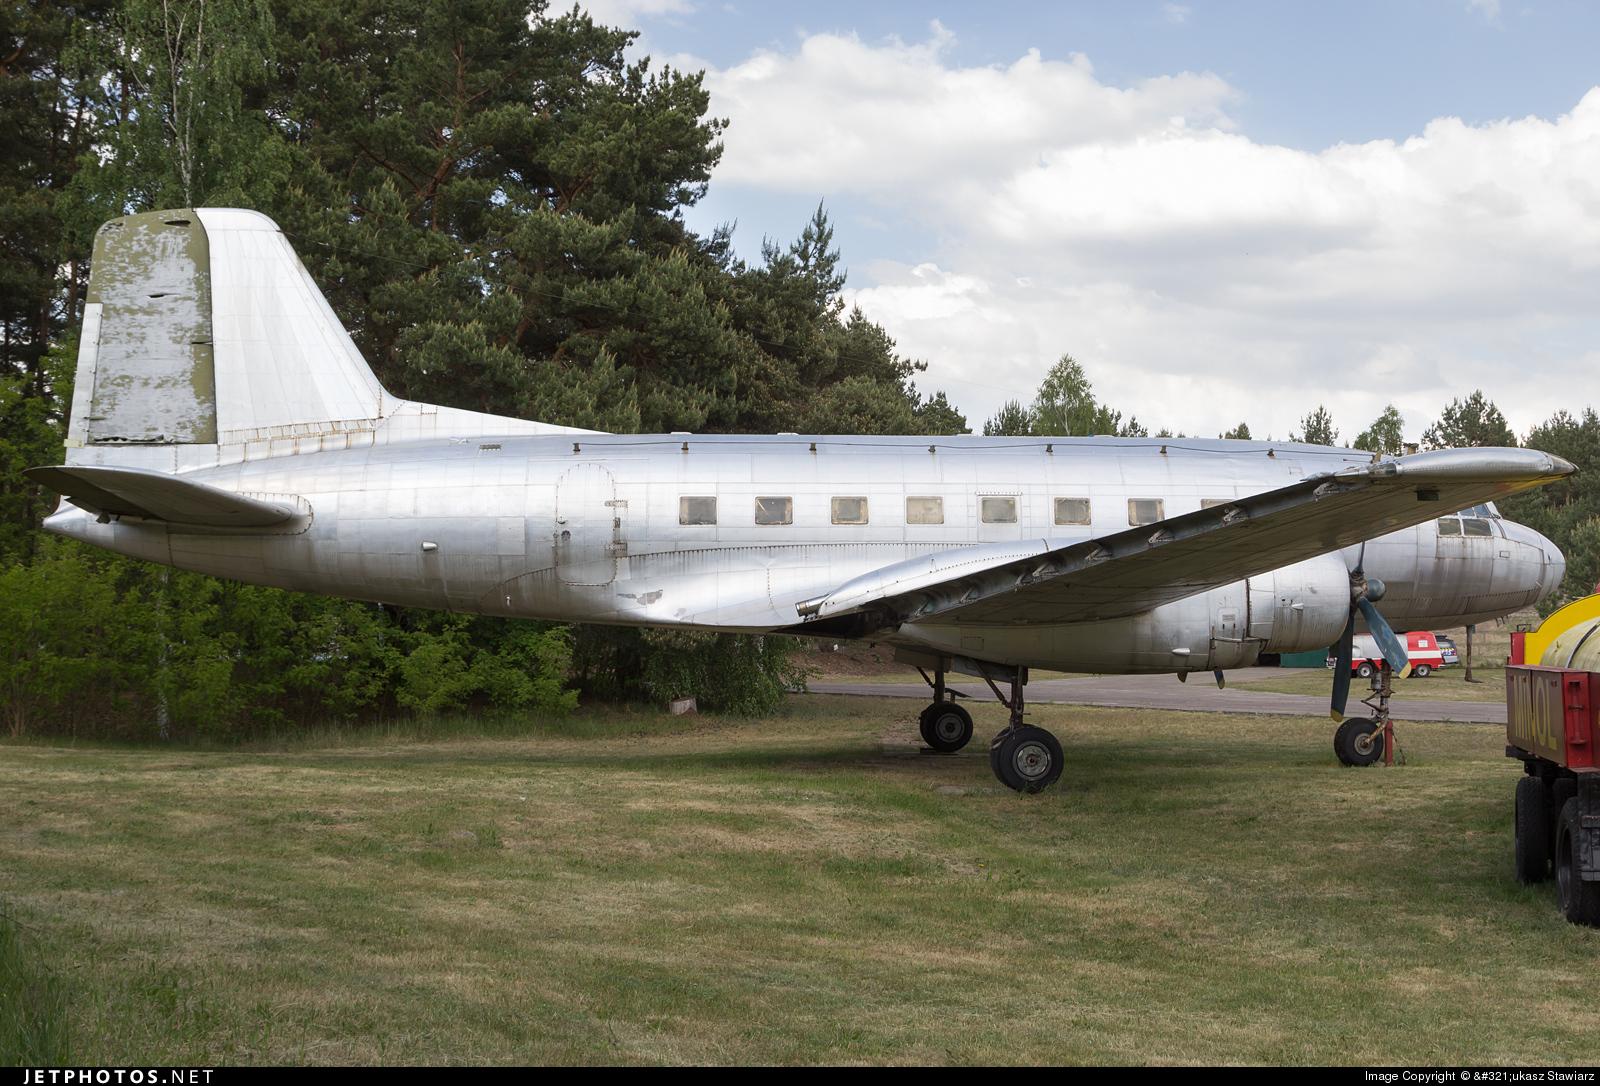 482 - VEB Flugzeugbau IL-14P - German Democratic Republic - Air Force